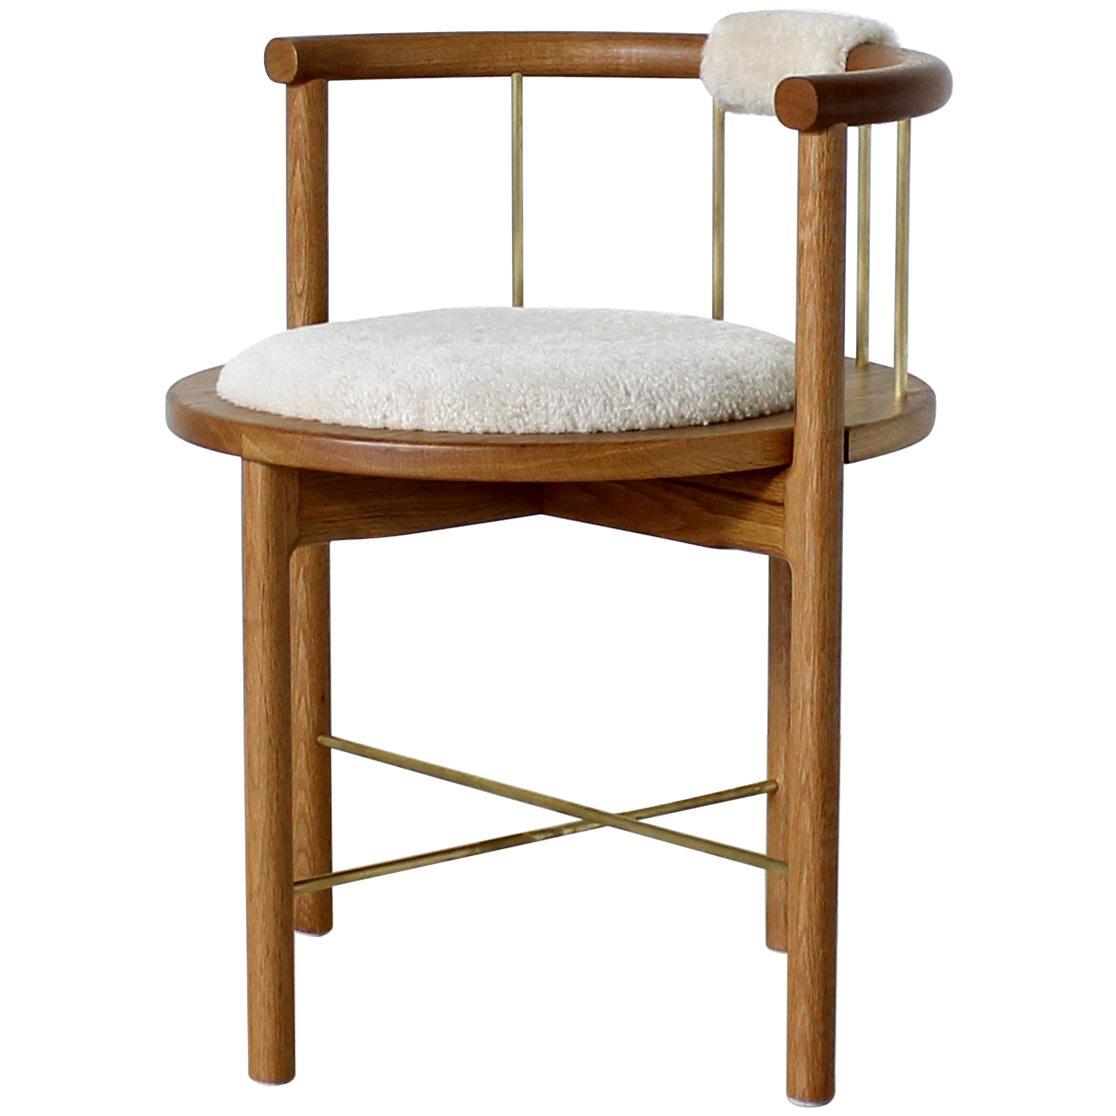 Modern Lloyd Accent Chair in White Oak, Brass, Shearling